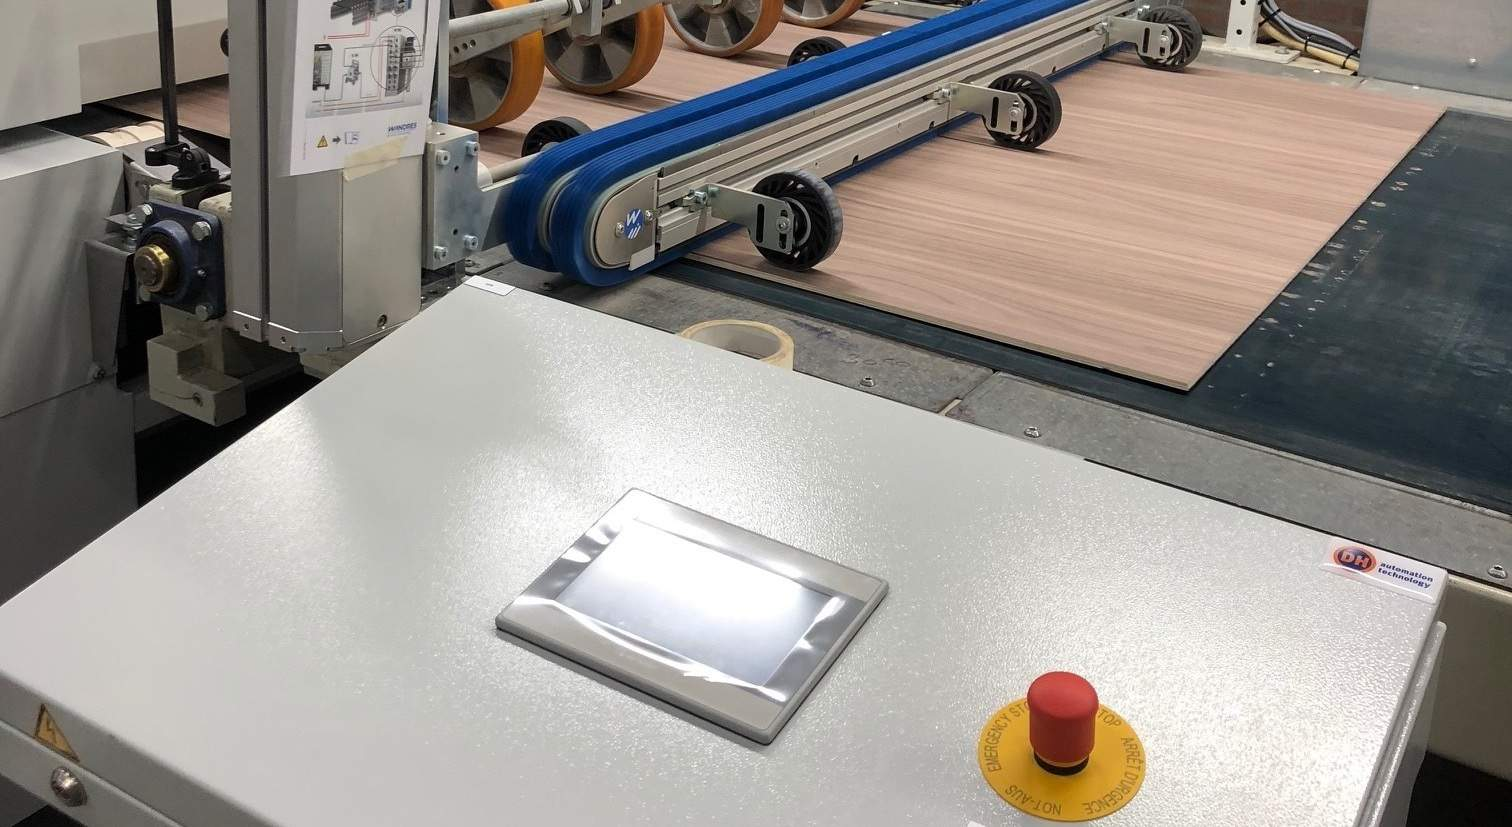 IA Slider Industriele automatisering Lessenaar touchscreen hmi 2